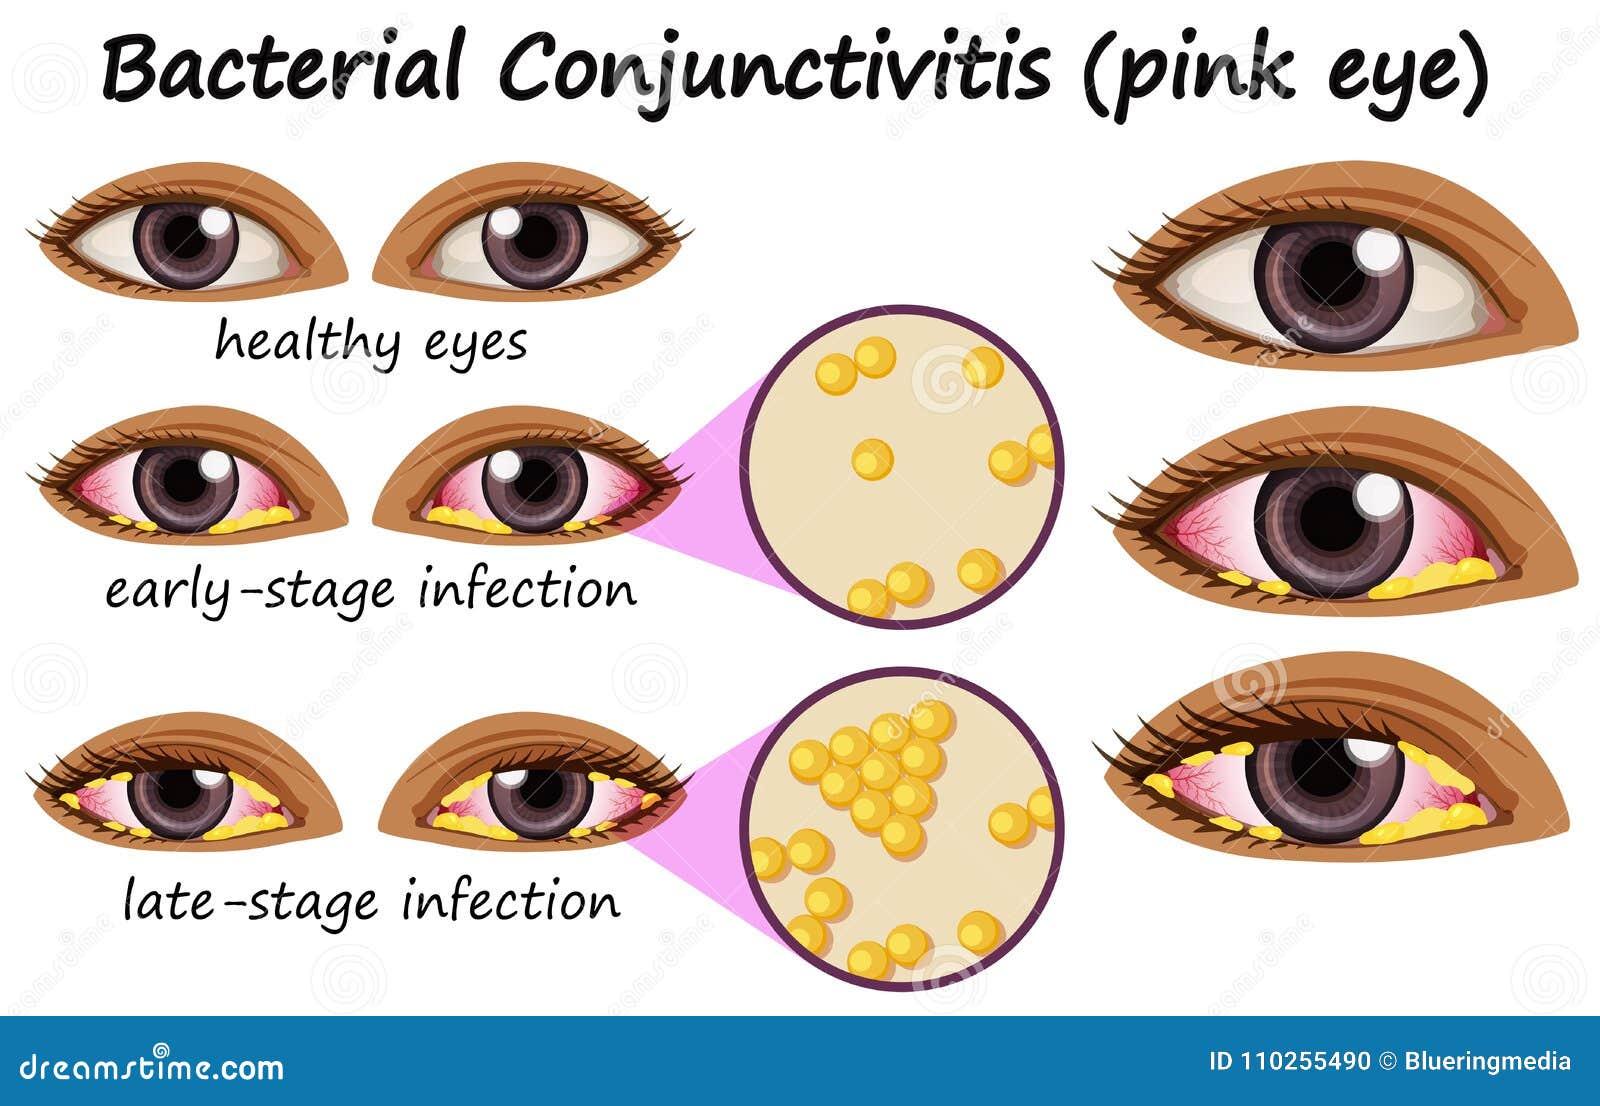 Diagram Showing Bacterial Conjunctivitis In Human Eye Stock Vector Image Download Preview